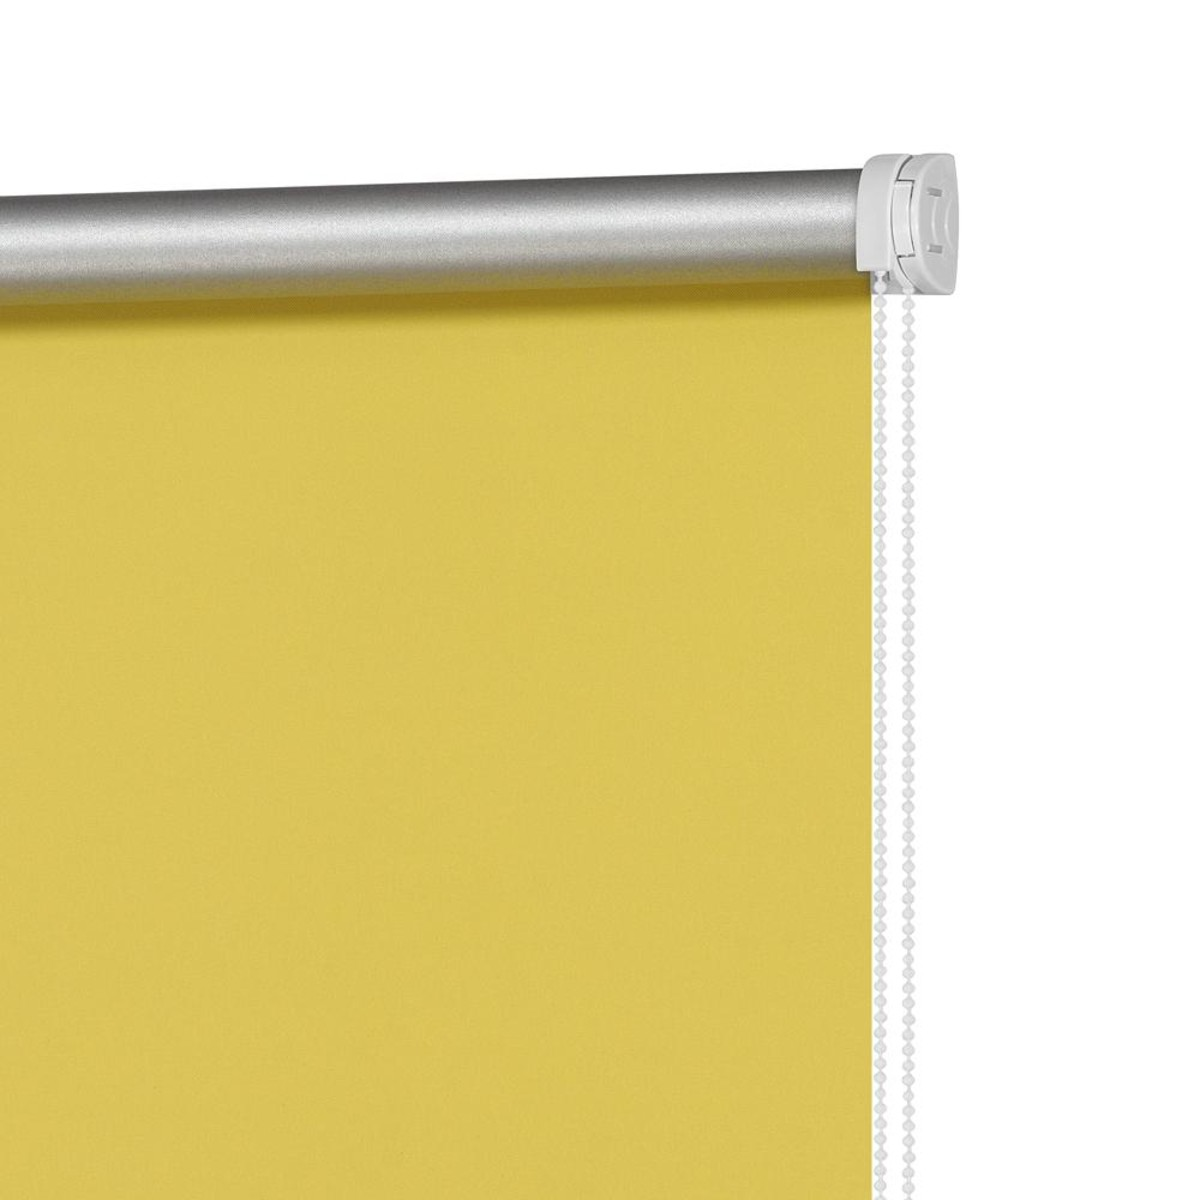 Рулонная Ора Decofest Плайн 100Х160 Цвет Желтый